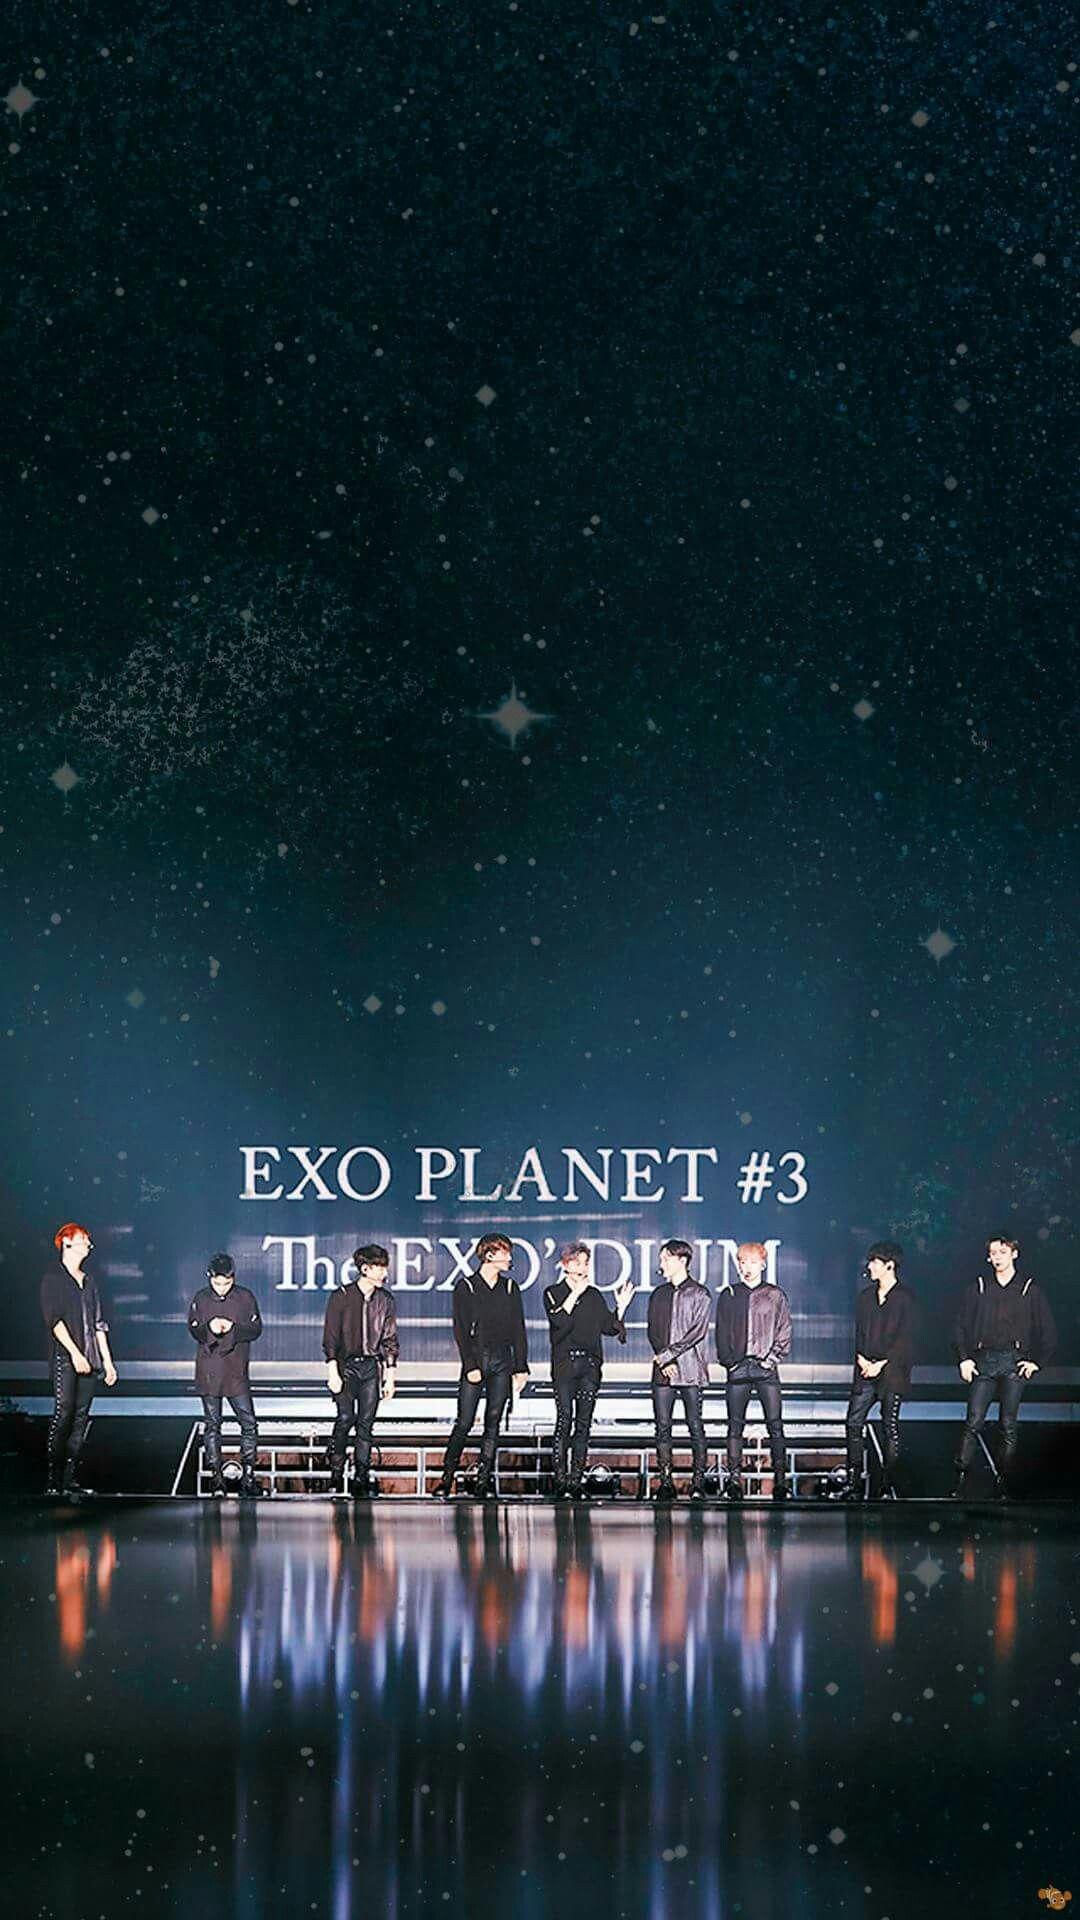 Exo iphone wallpaper tumblr - Exo Wallpaper